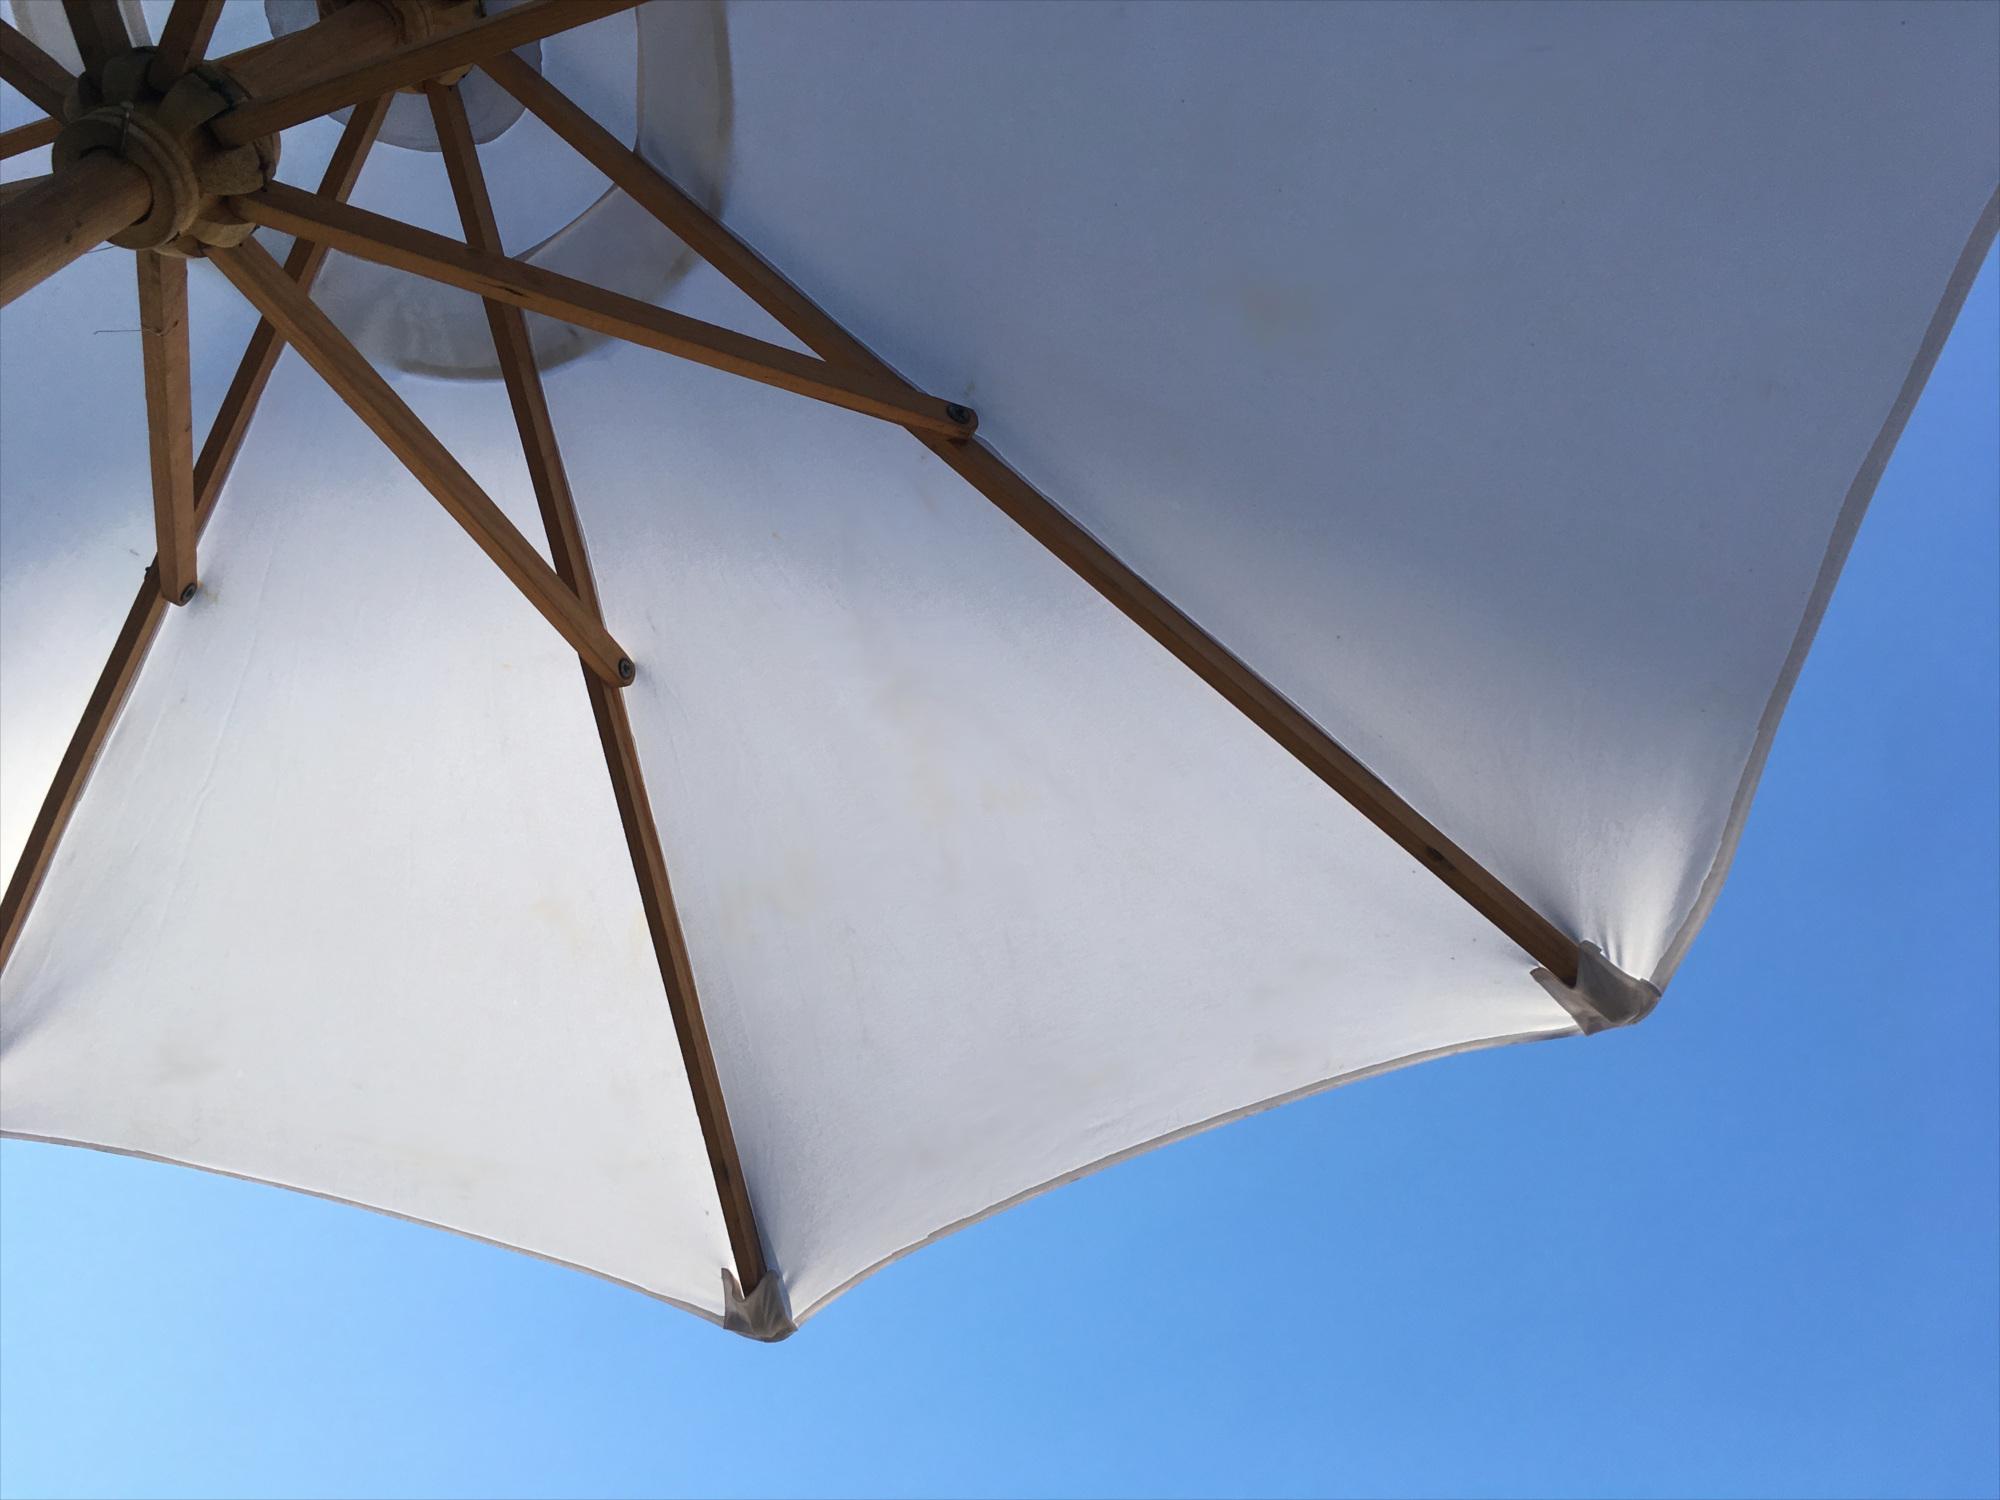 mobili e ombrelloni da giardino sardegna nuoro